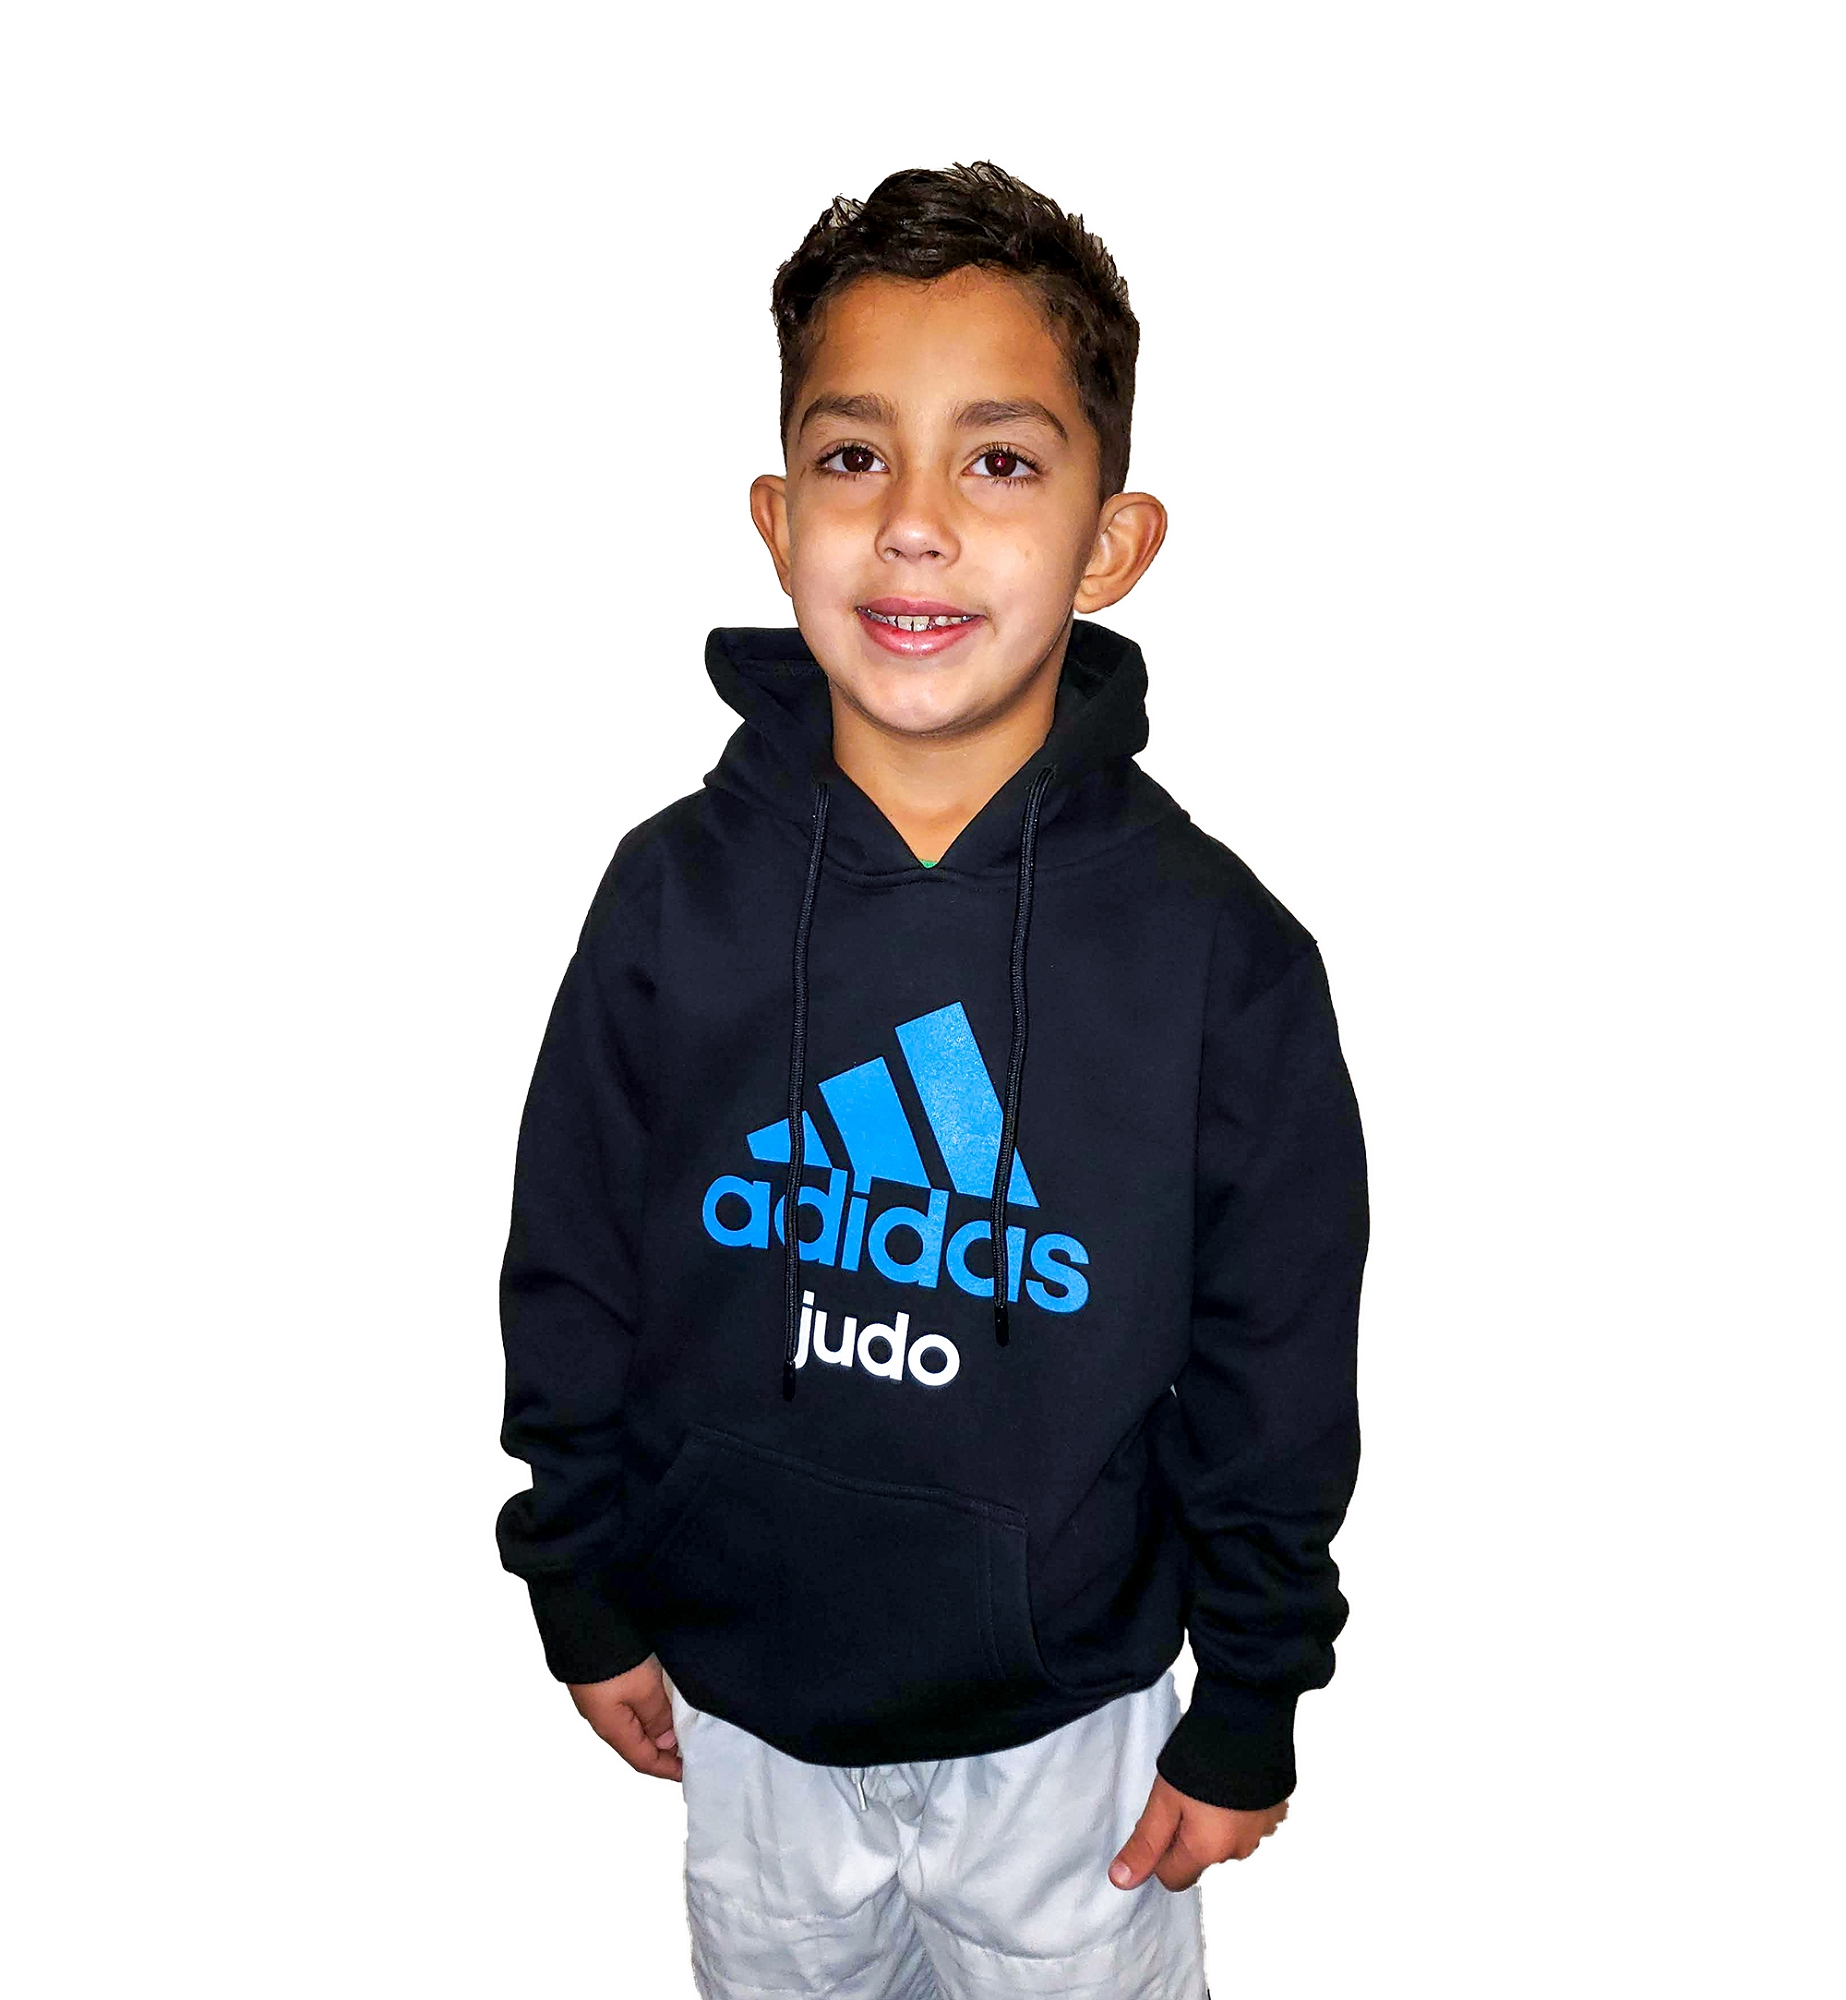 Adidas Black Hoodie Black Judo Youth Judo Youth Adidas Hoodie deBoCx